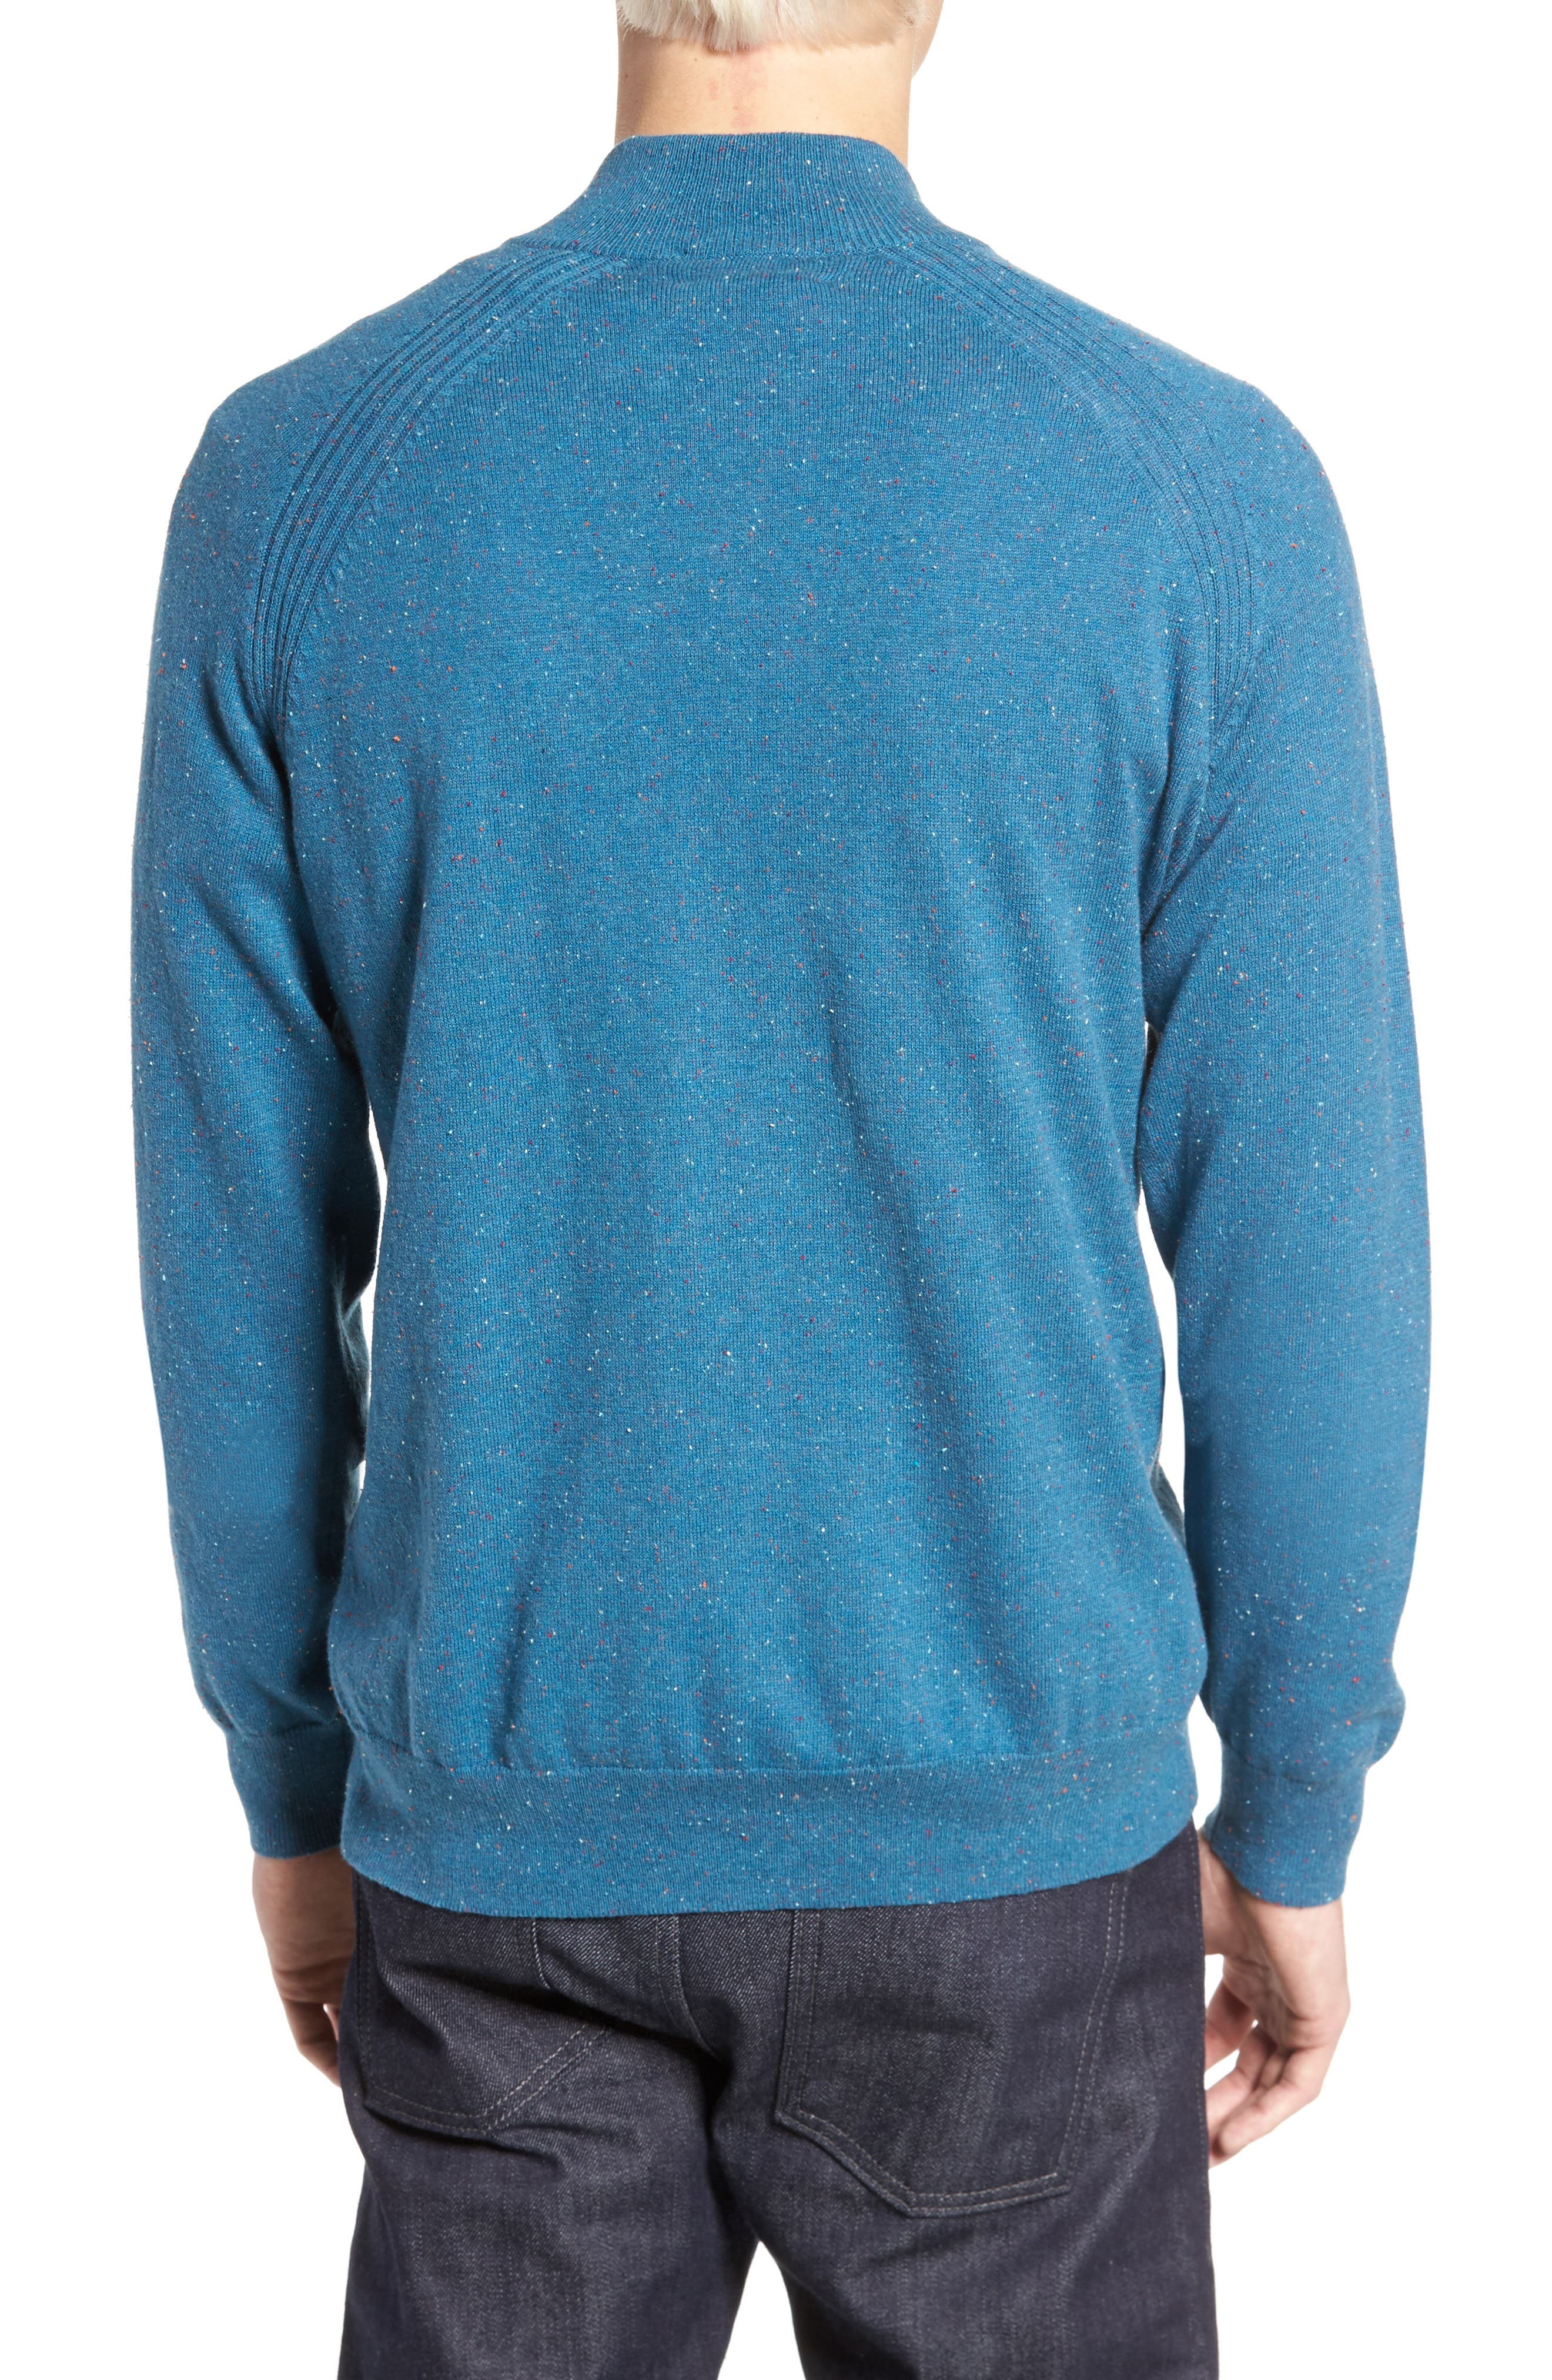 Donegal Quarter Zip Pullover,                             Alternate thumbnail 2, color,                             445